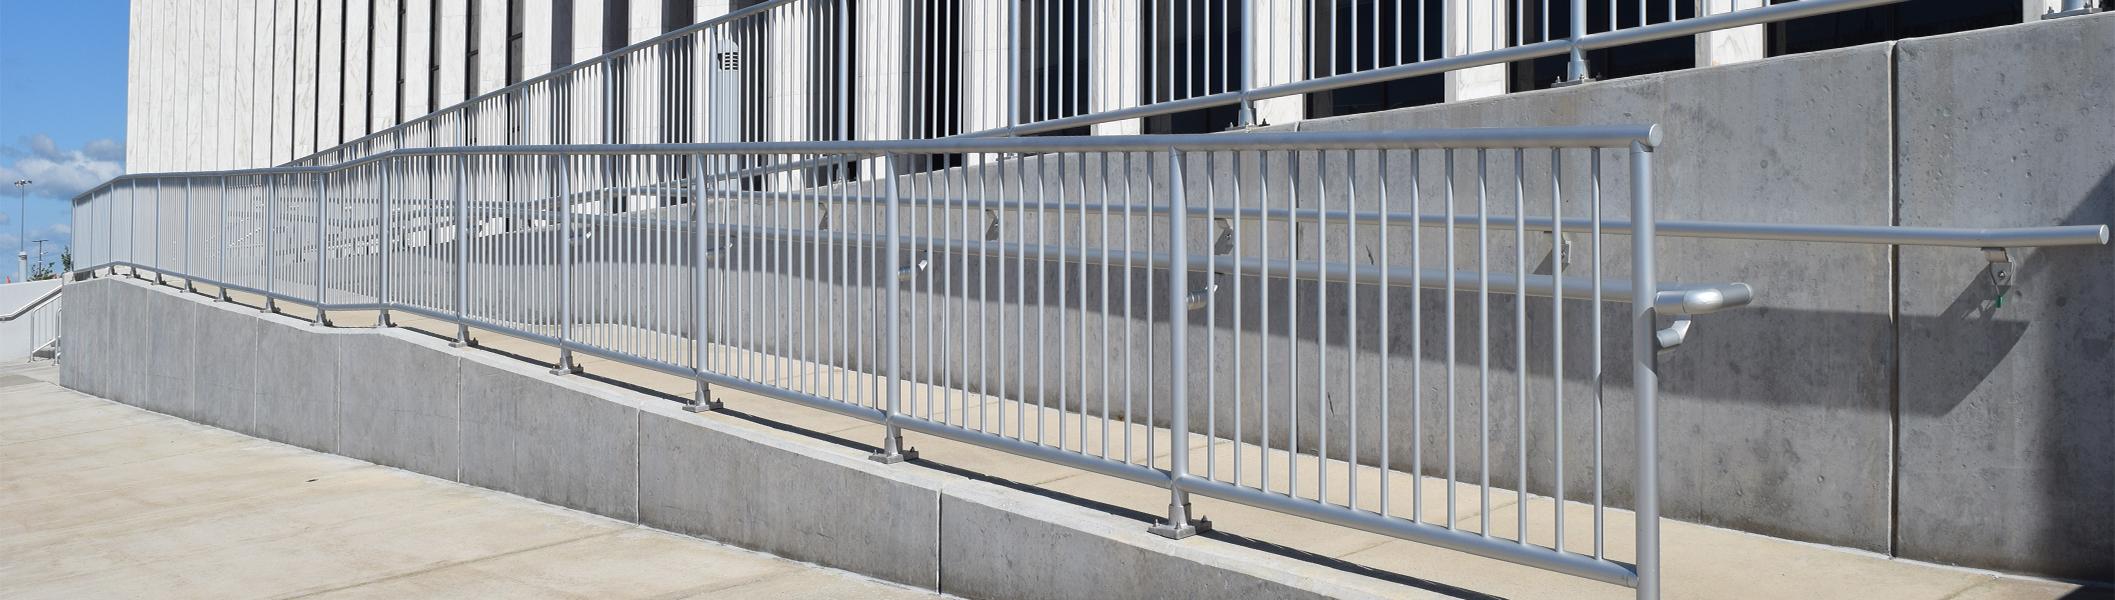 Aluminum Handrail | Ideal Shield